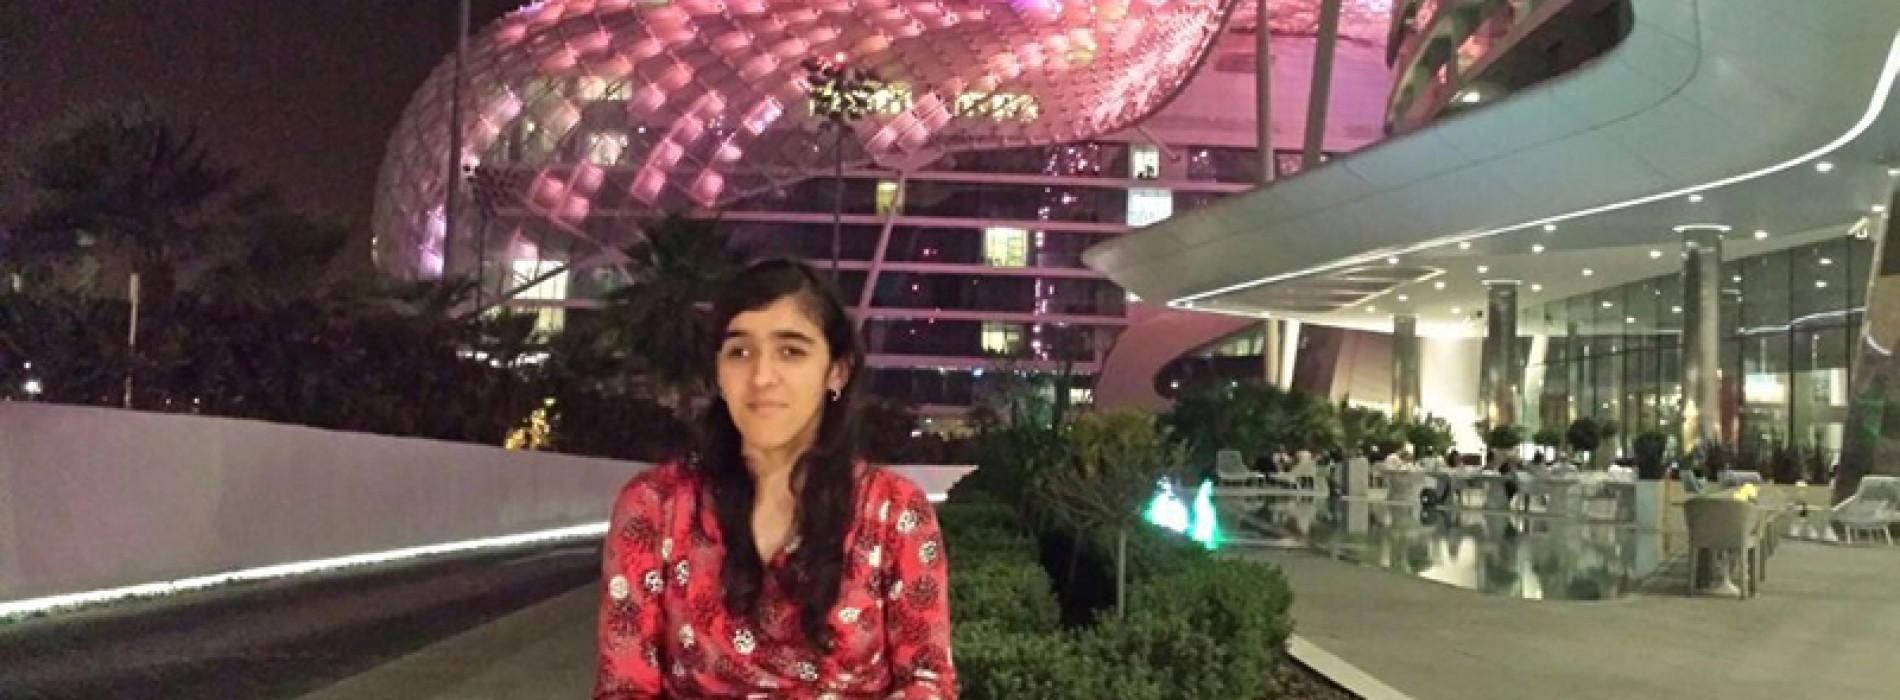 Arabian Gulf trip to the beautiful city of Dubai in a wheelchair